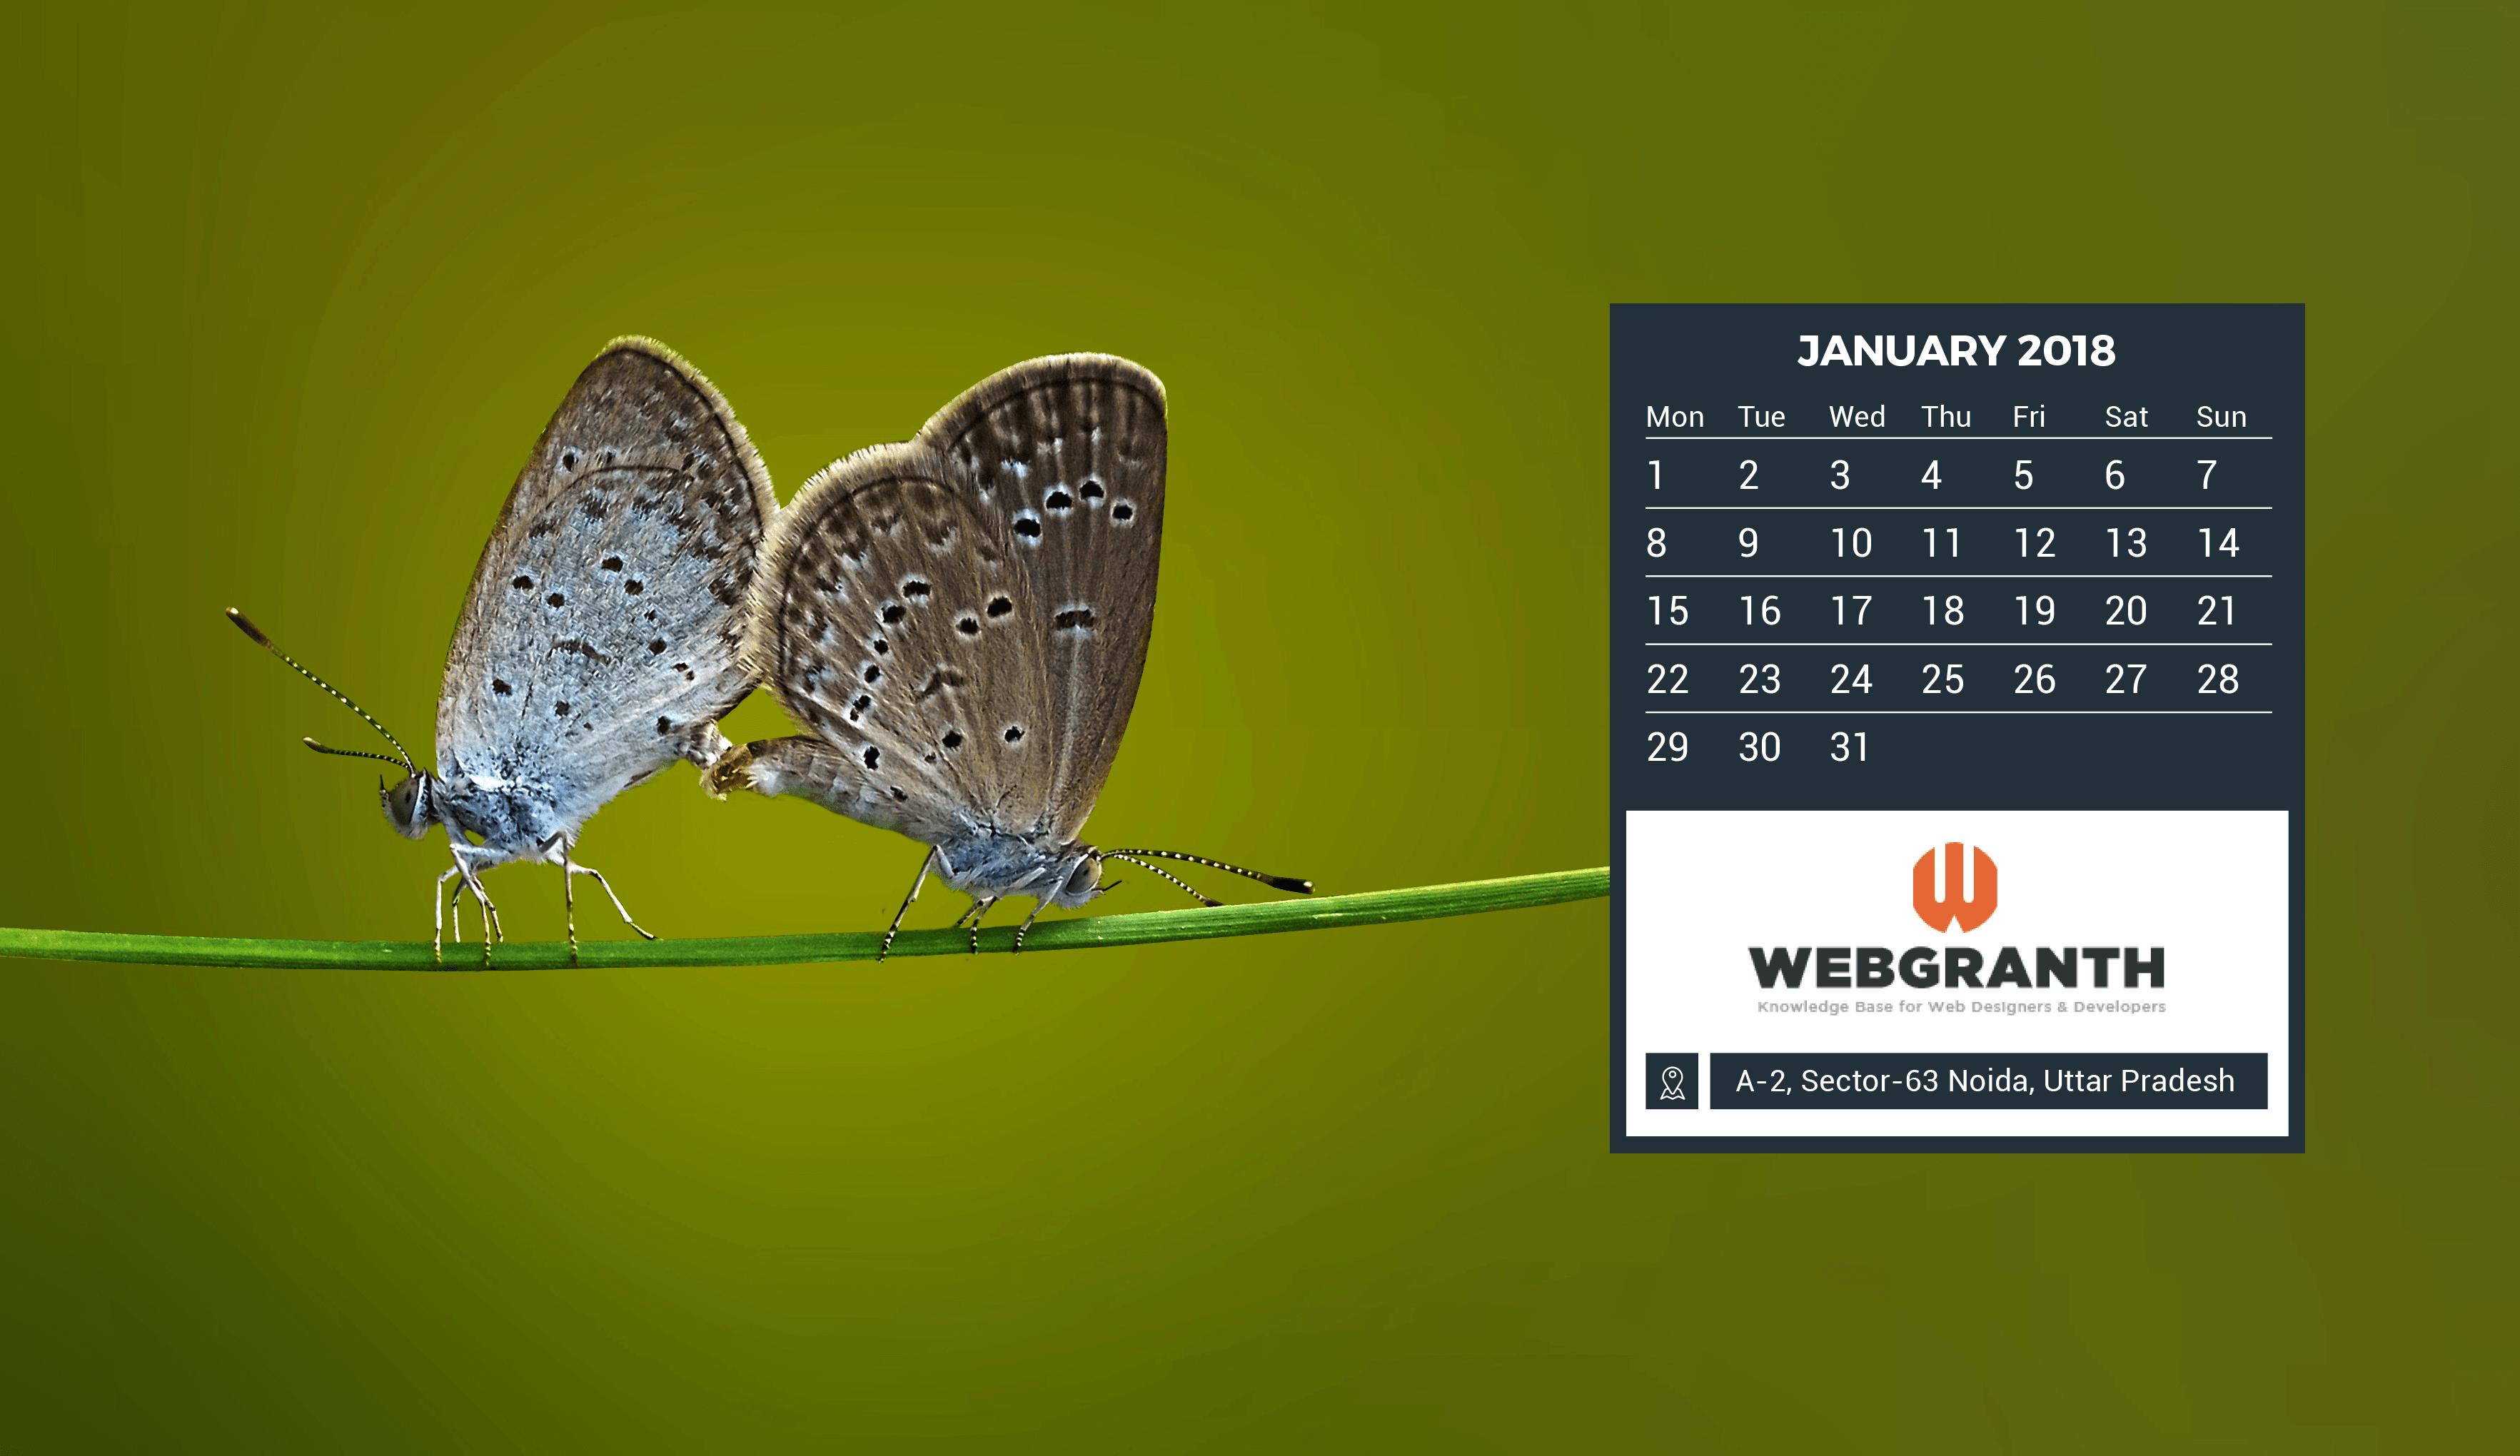 January 2018 Calendar Wallpaper View HD Image of January 3530x2040